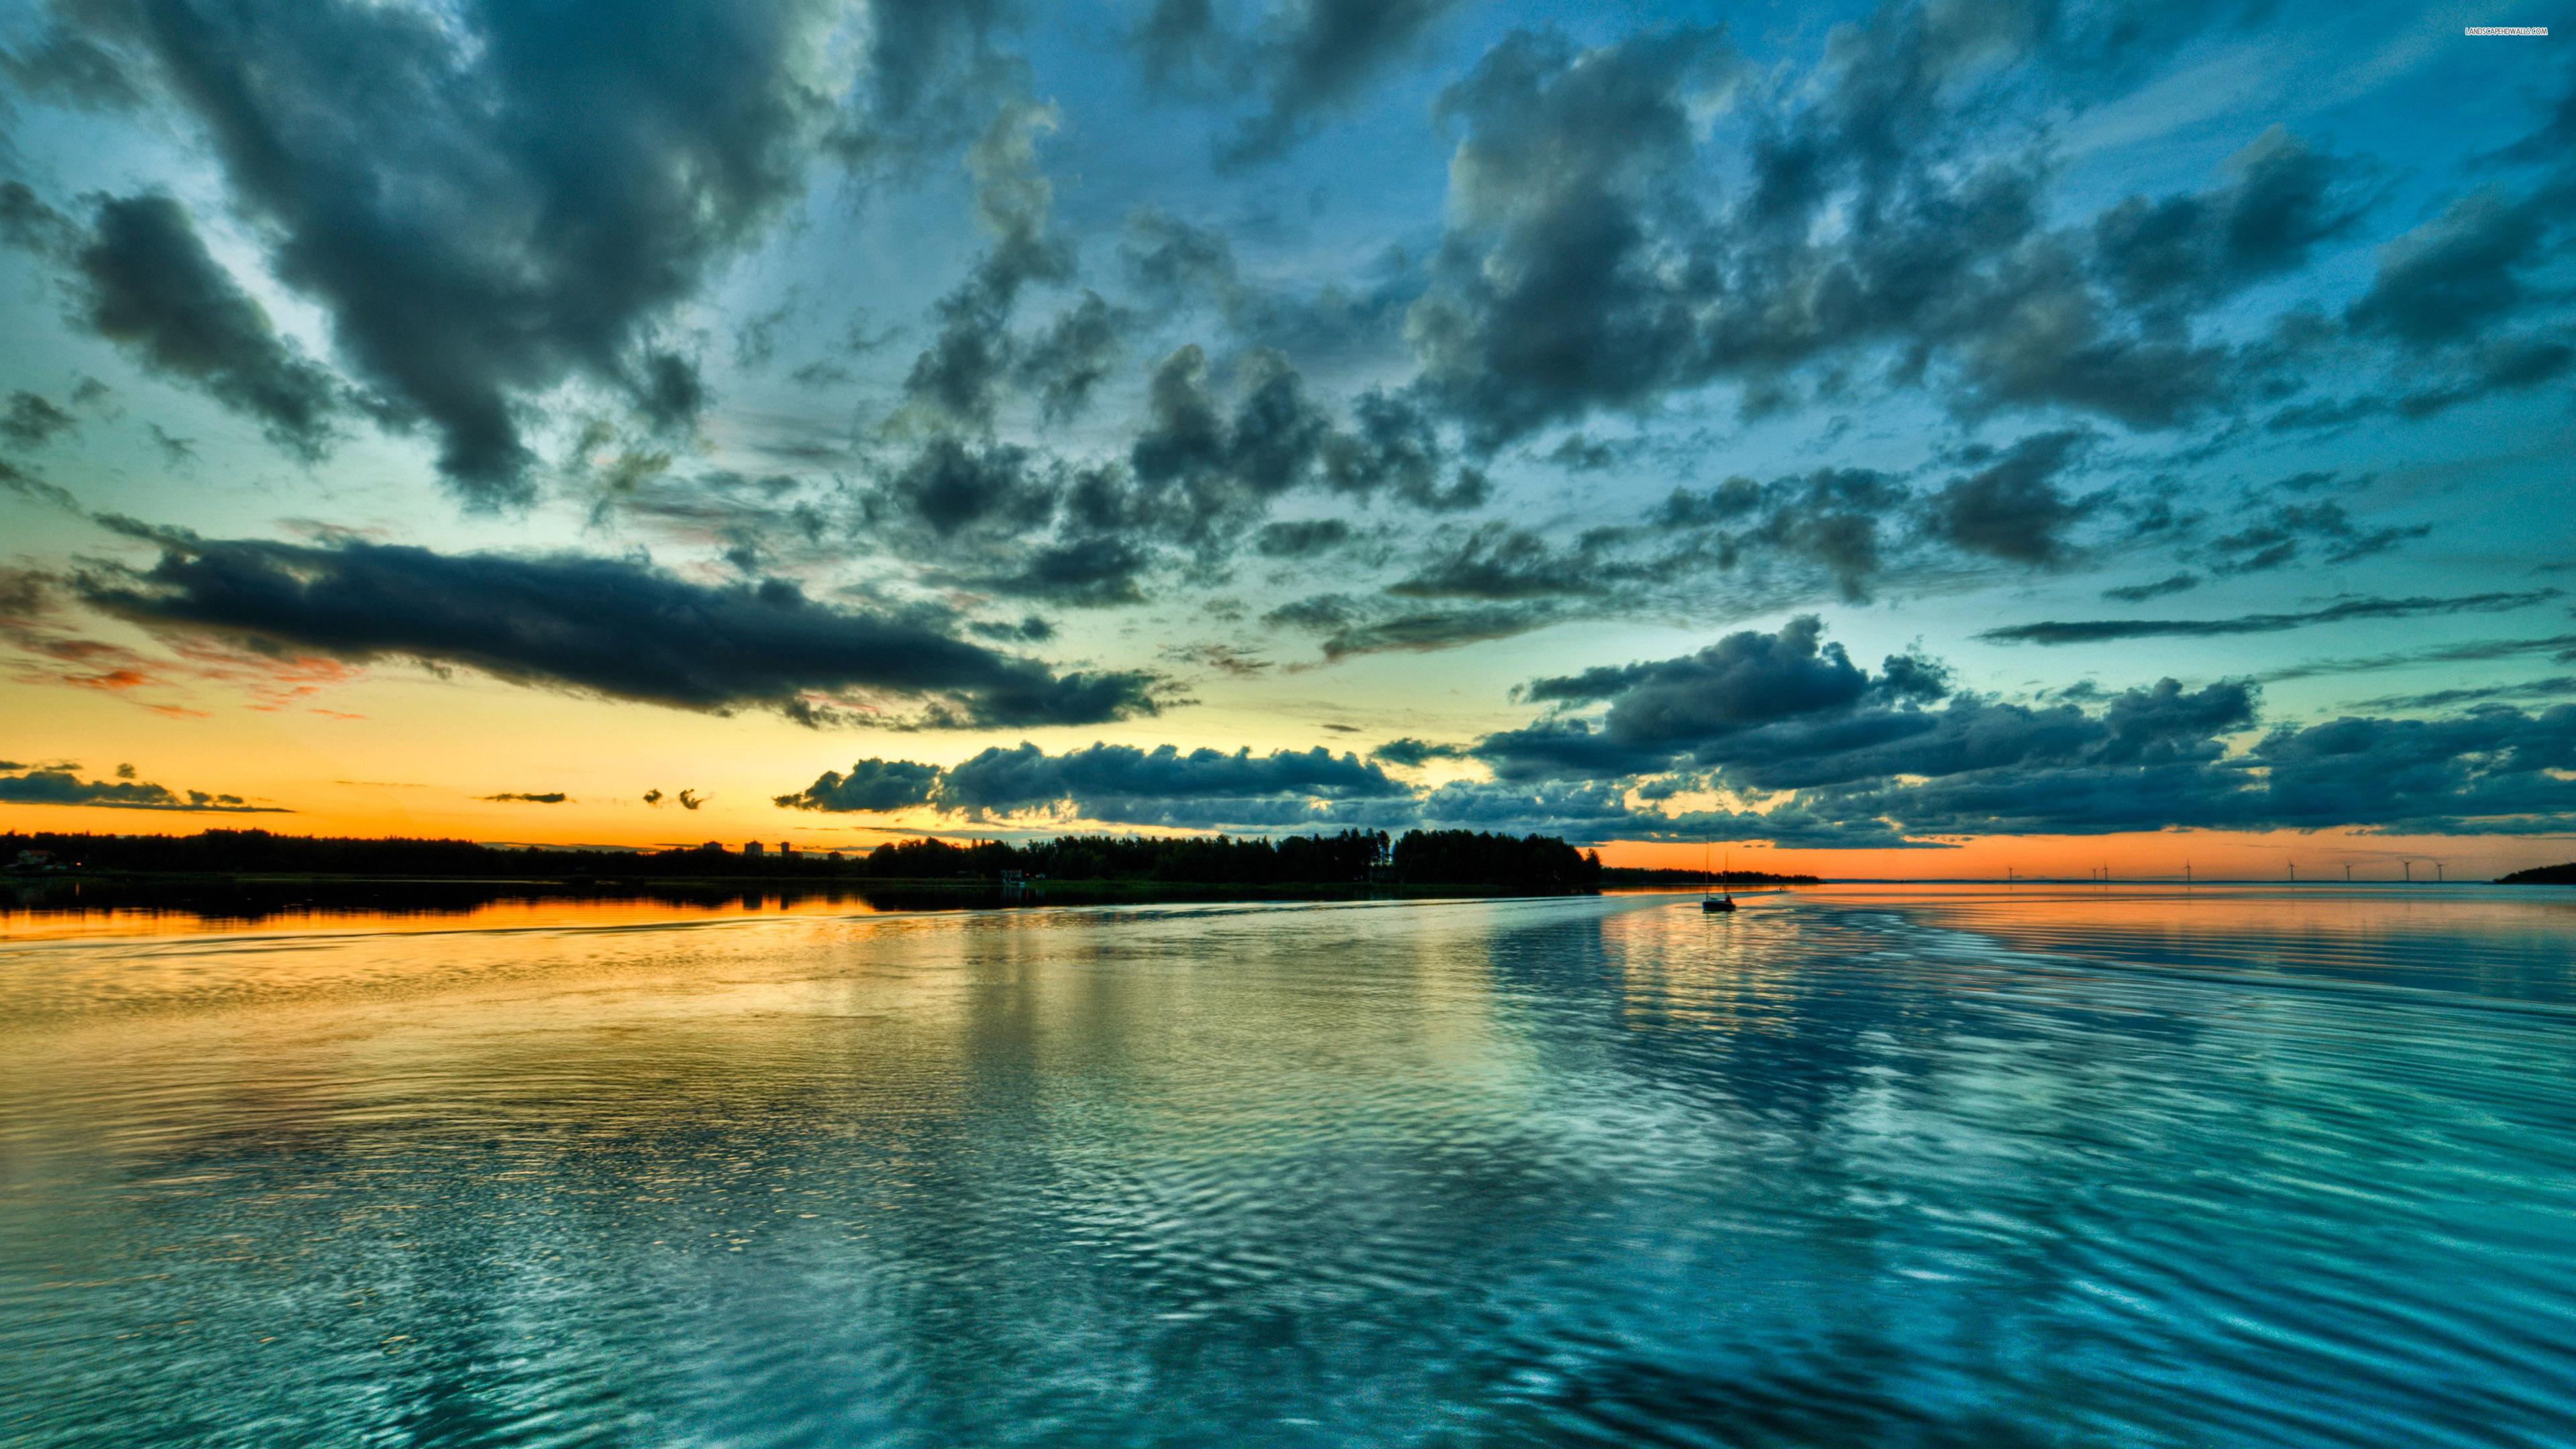 Wallpaper 4k Perfect Blue Sunset Blue Wallpapers Nature Wallpapers Sky Wallpapers Sunset Wallpapers Water Wallpapers